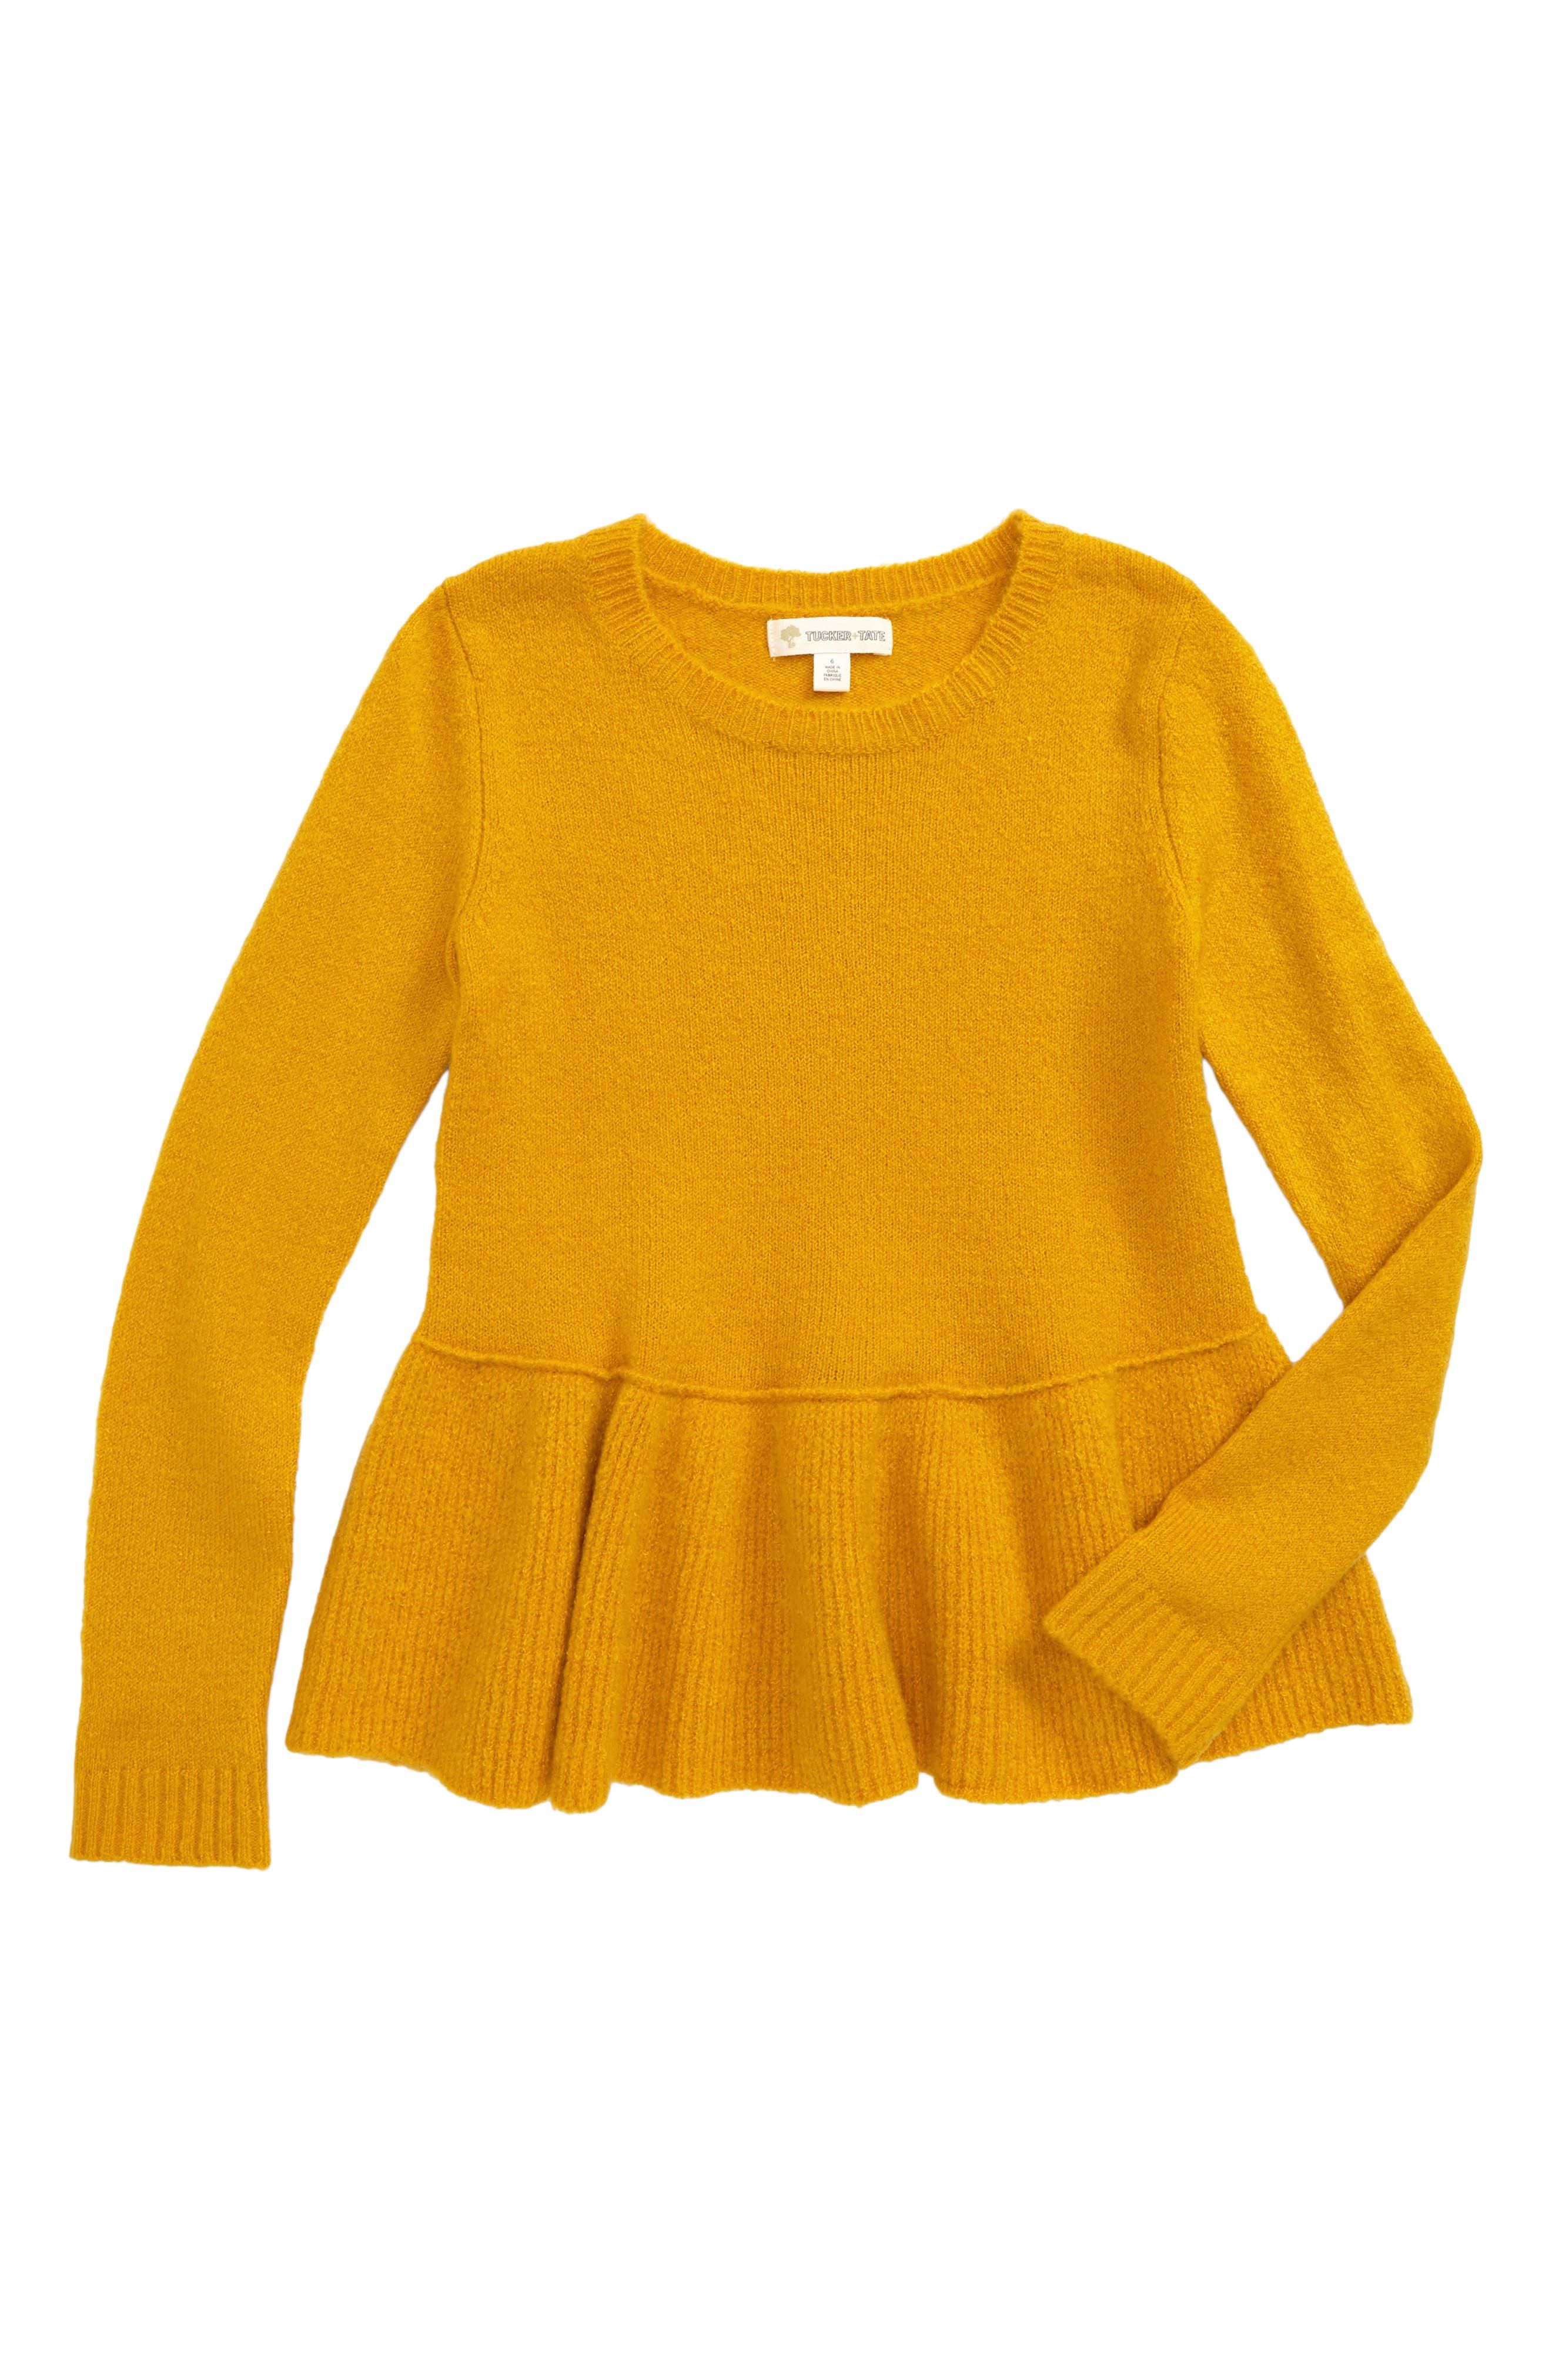 Main Image - Tucker + Tate Ruffle Hem Sweater (Toddler Girls, Little Girls & Big Girls)